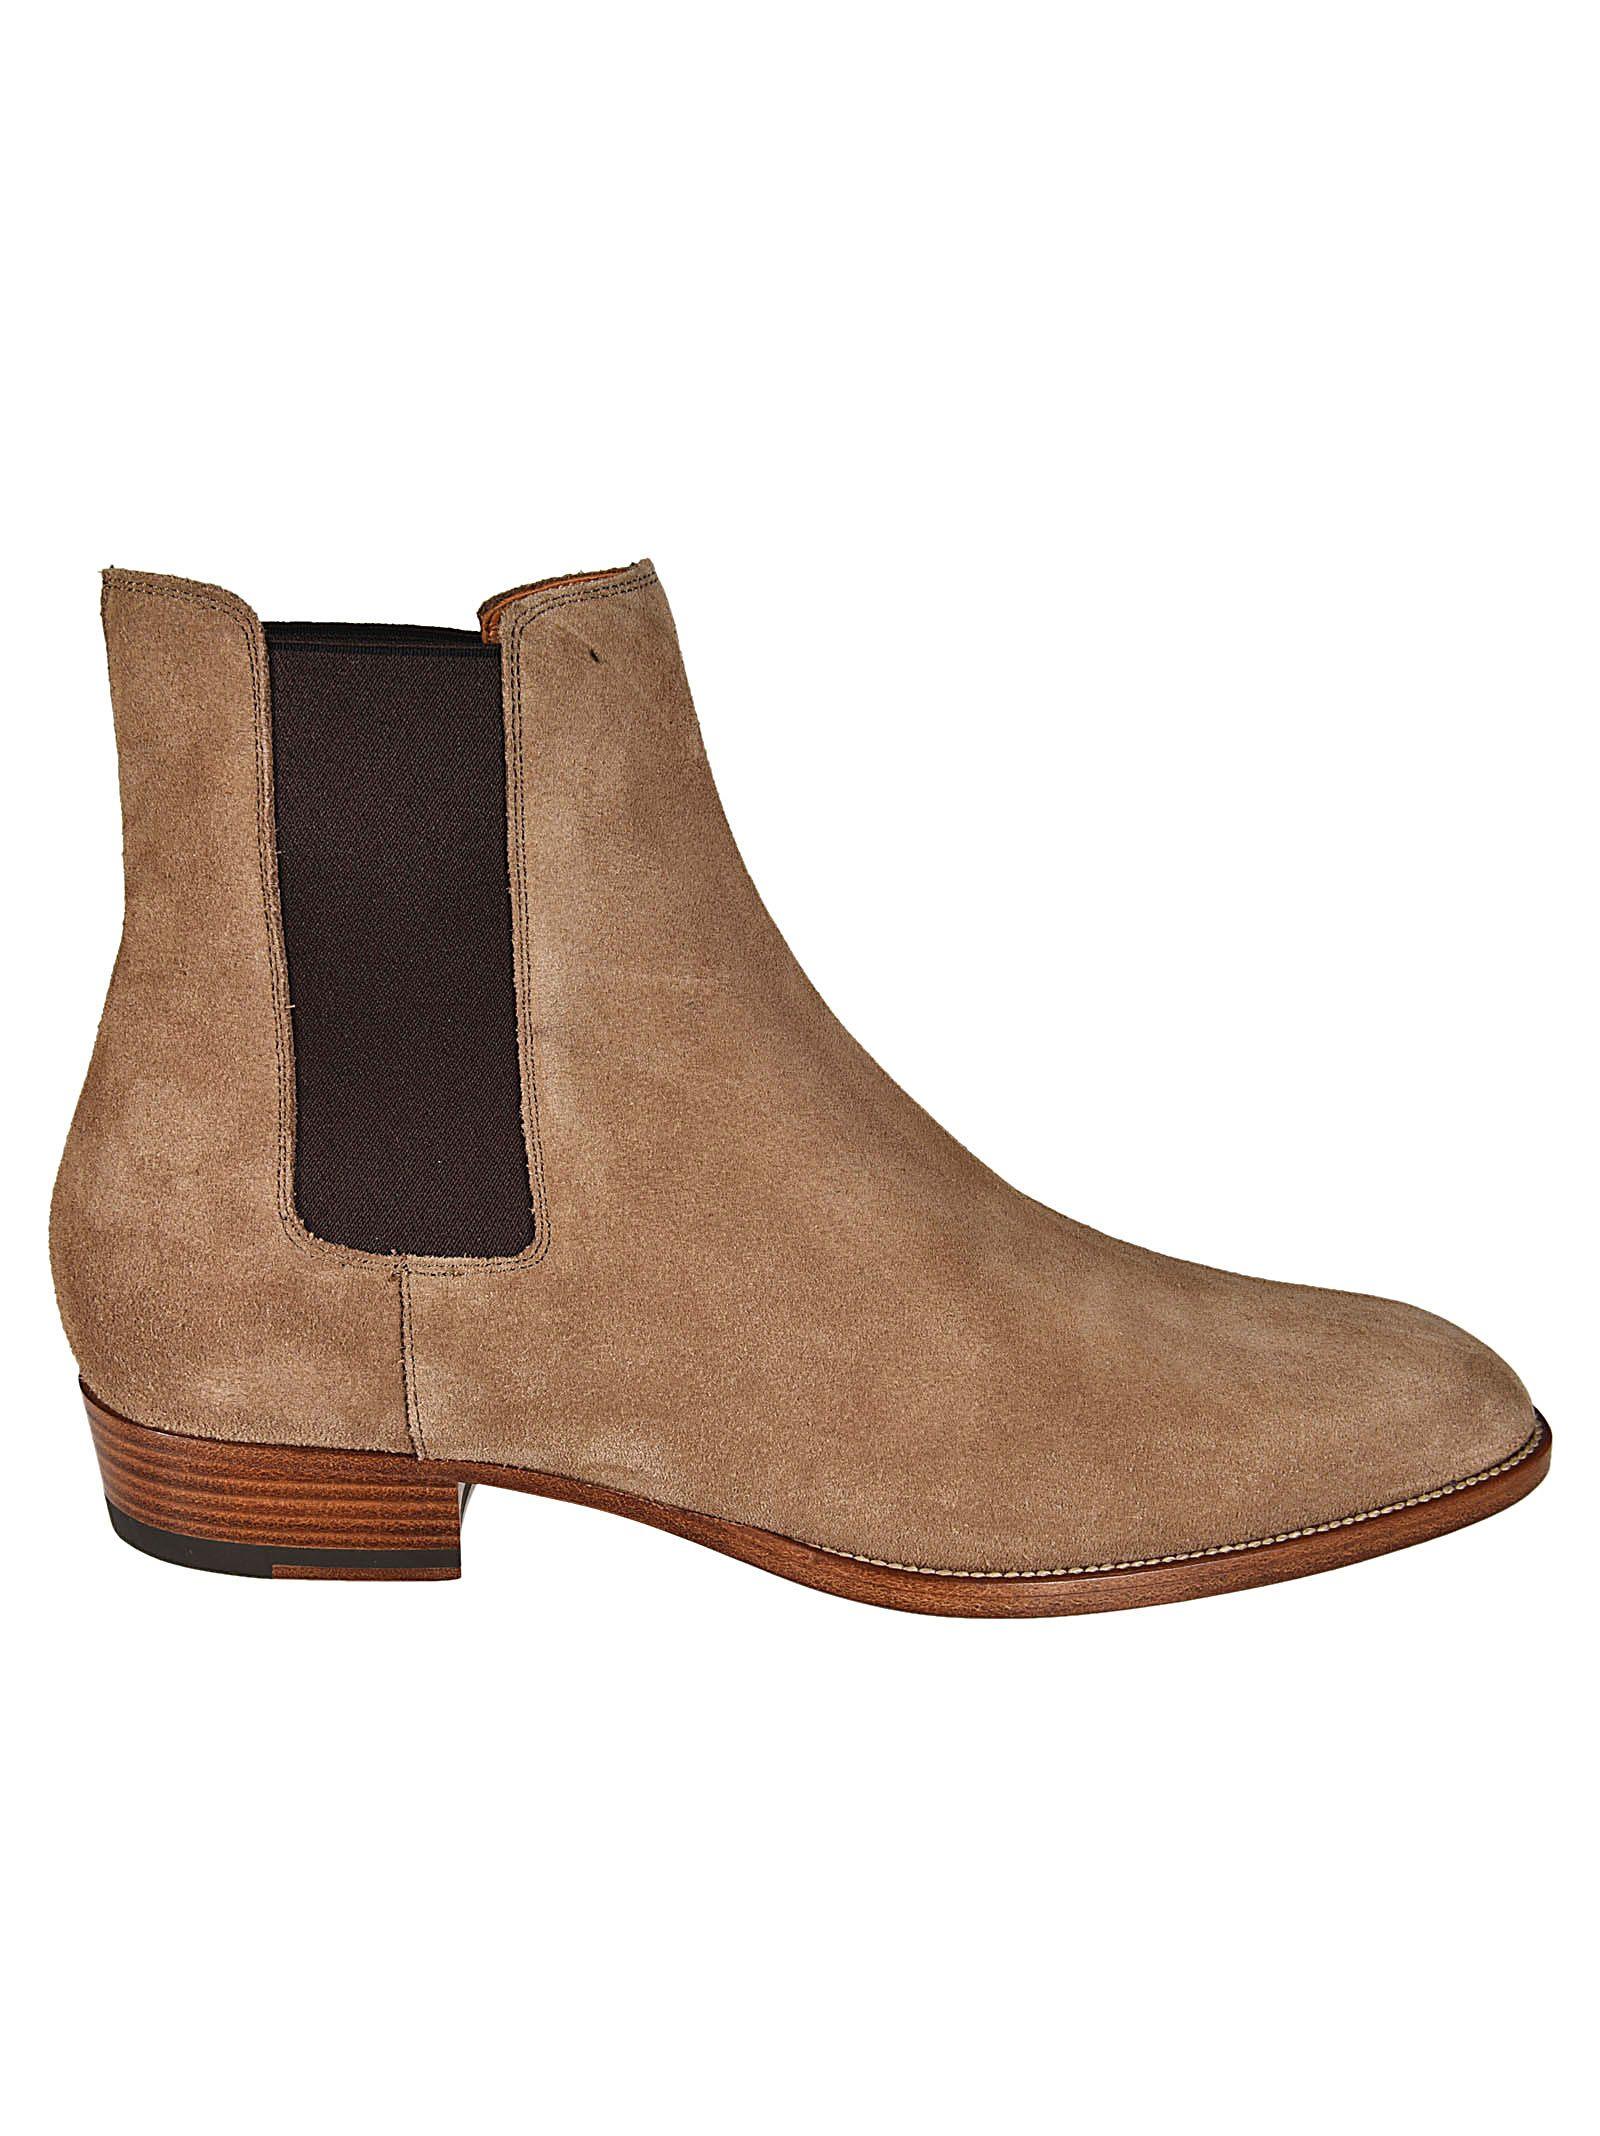 Saint Laurent Classic Wyatt 30 Chelsea Boots